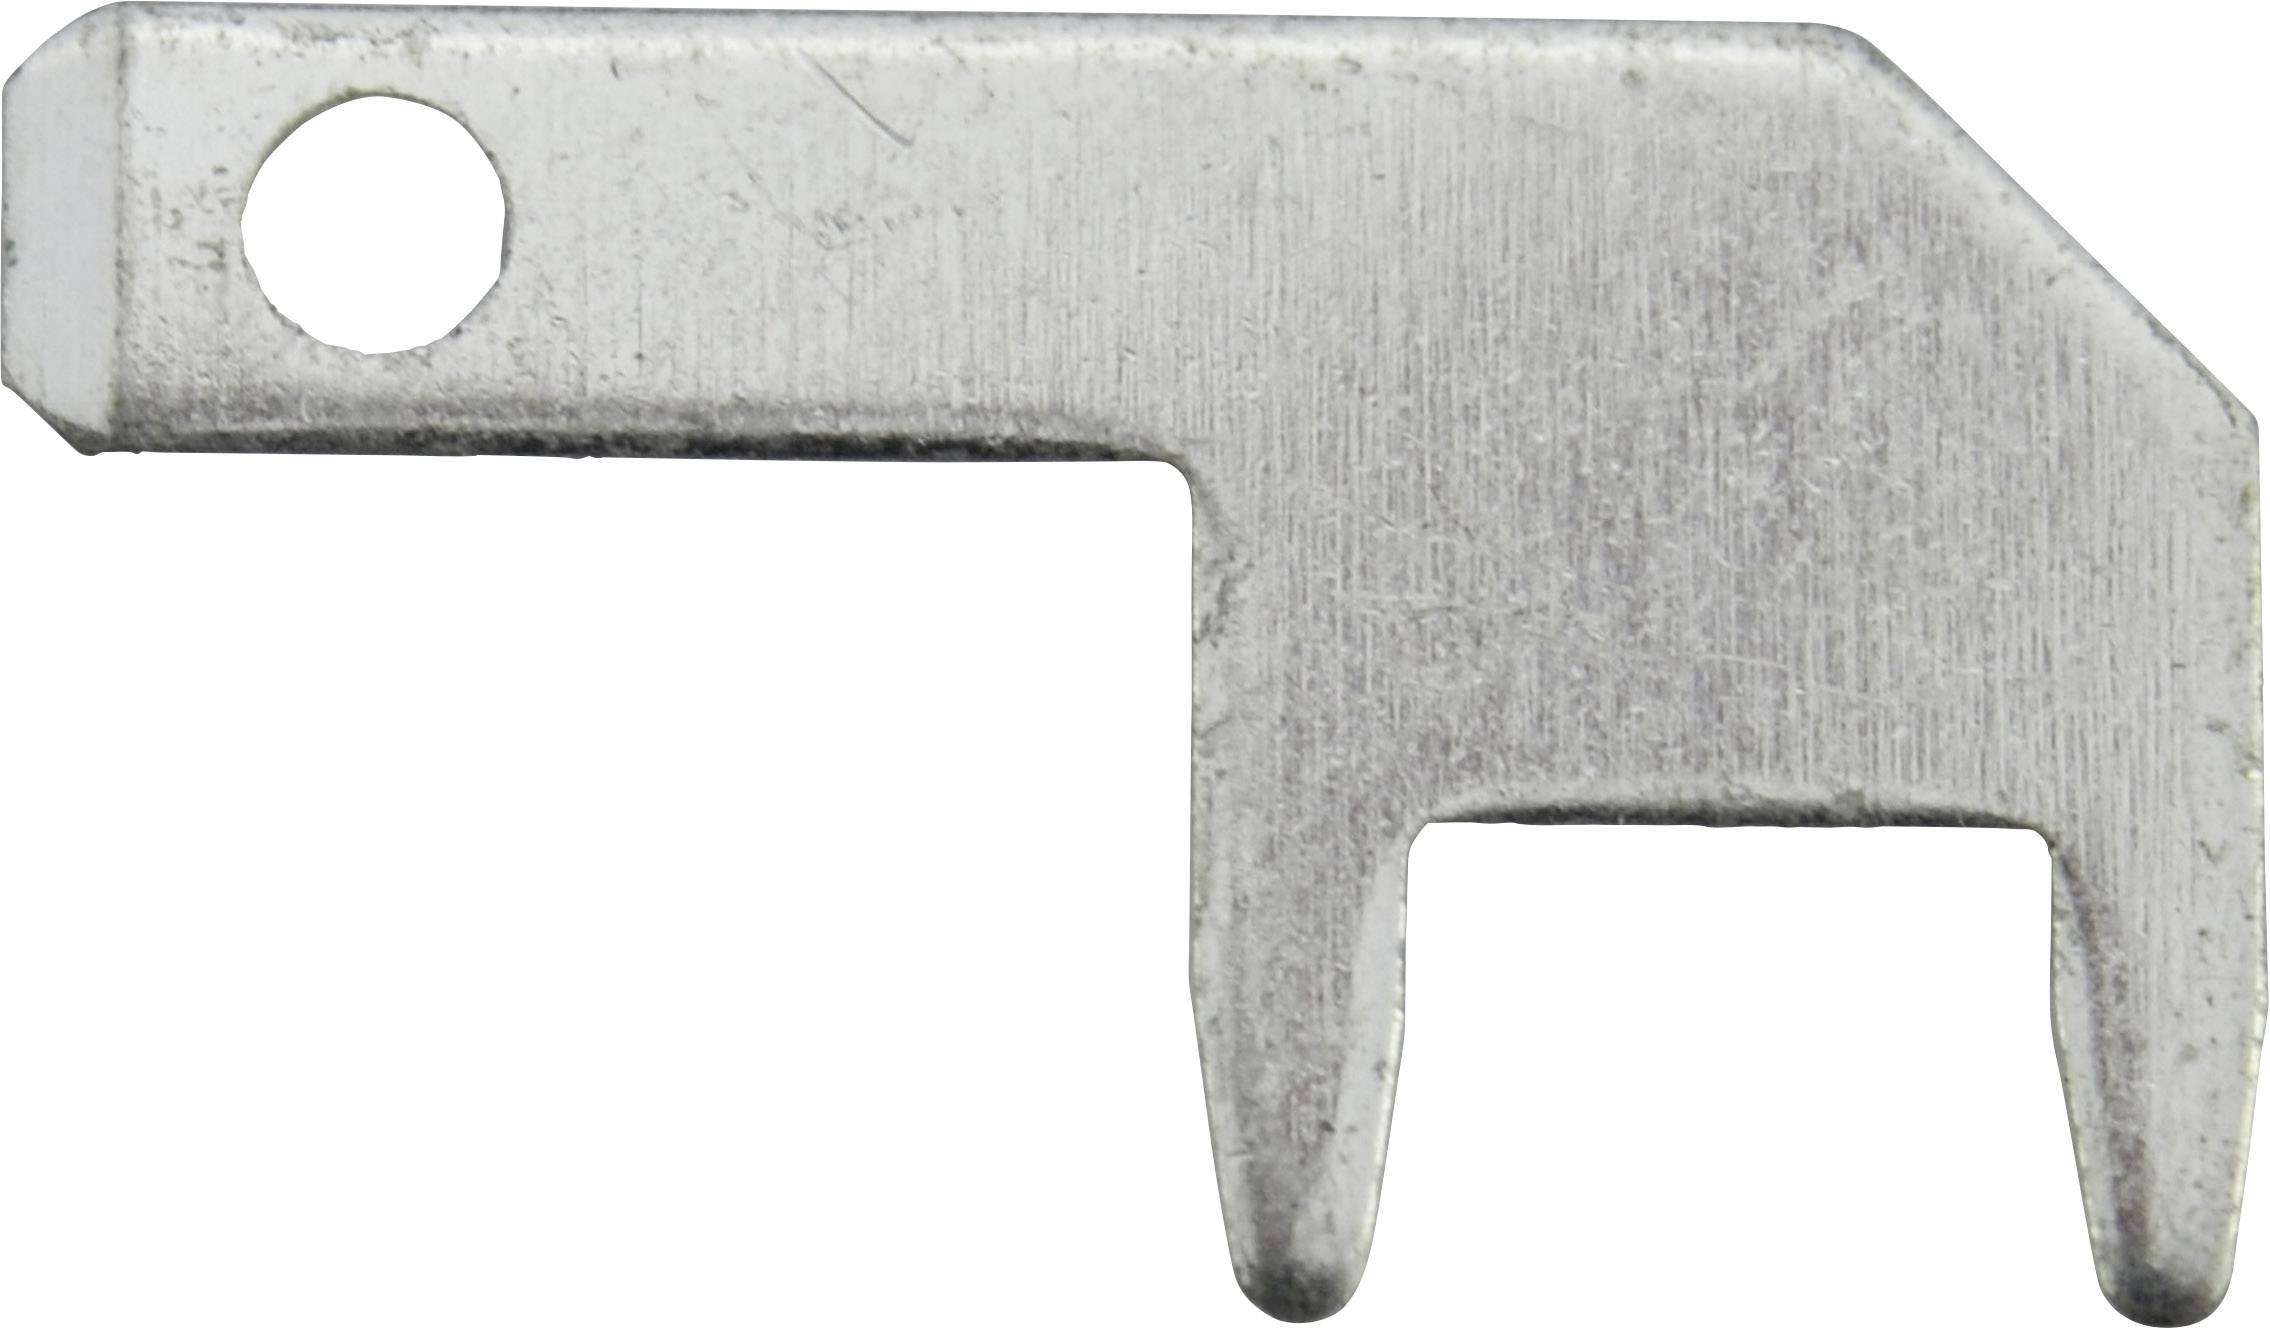 Faston zástrčka Vogt Verbindungstechnik 378905.68 2.8 mm x 0.5 mm, 90 °, bez izolace, kov, 100 ks